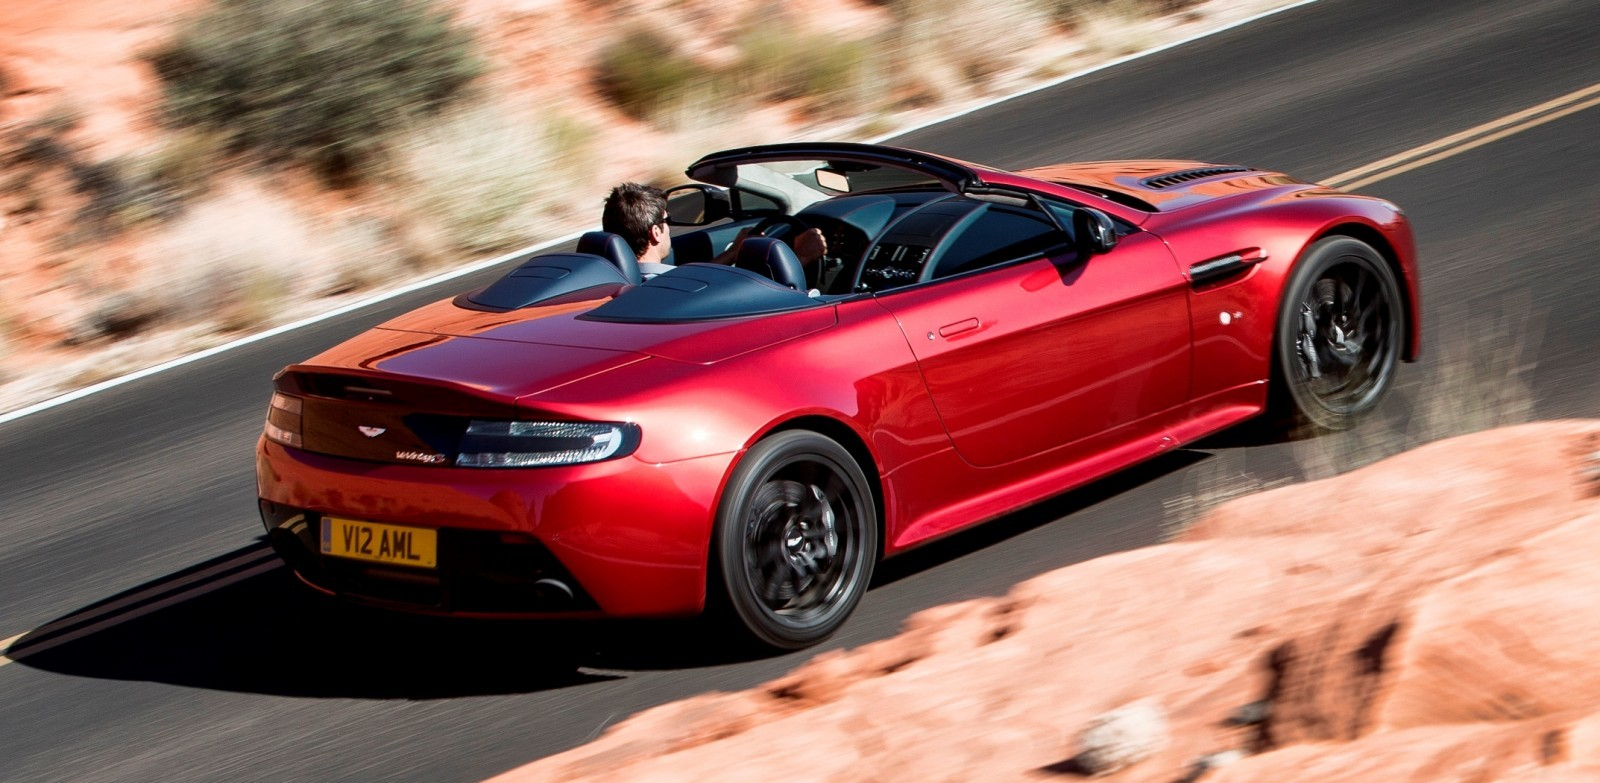 2014 Aston Martin V12 Vantage S Roadster 6